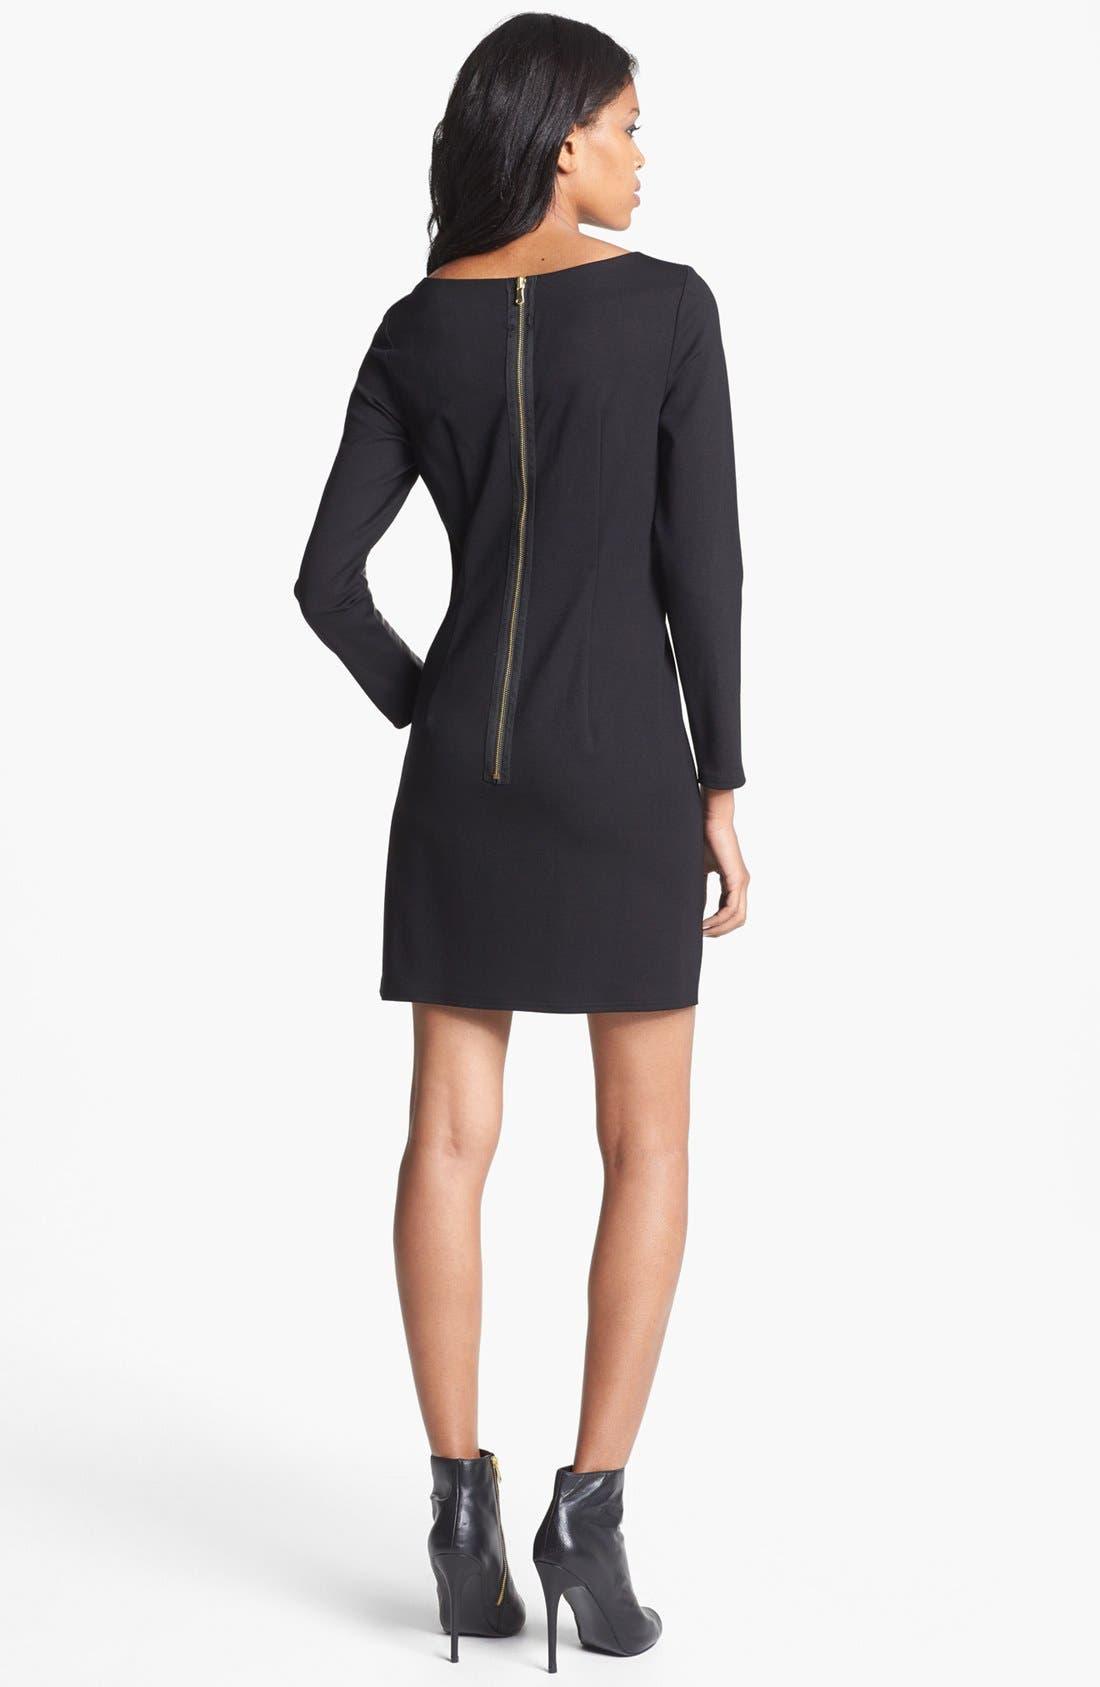 Alternate Image 2  - ALICE & TRIXIE 'Lourdes' Leather & Ponte Knit Dress